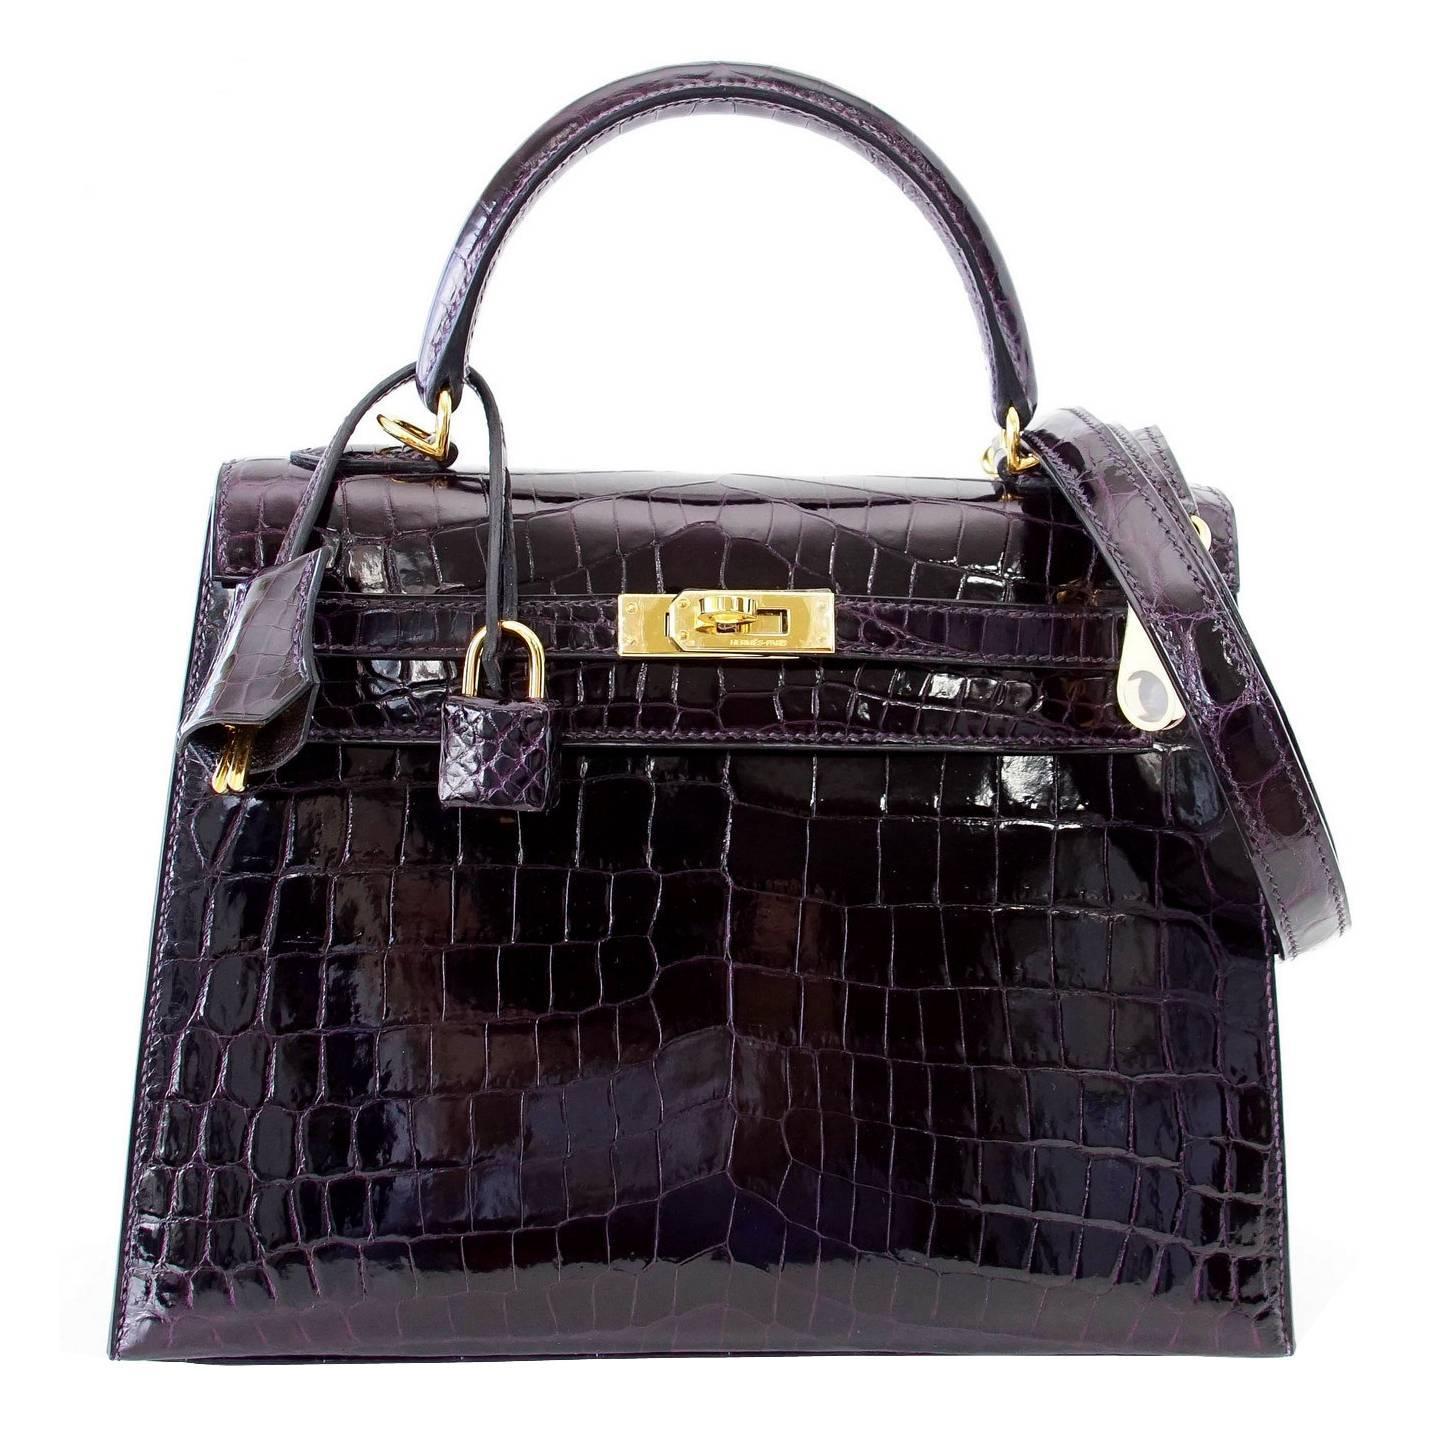 b8c45cabc2f5d ... usa hermes kelly 25 sellier bag crocodile prunoir gold hardware deep  plum purple for sale at ...